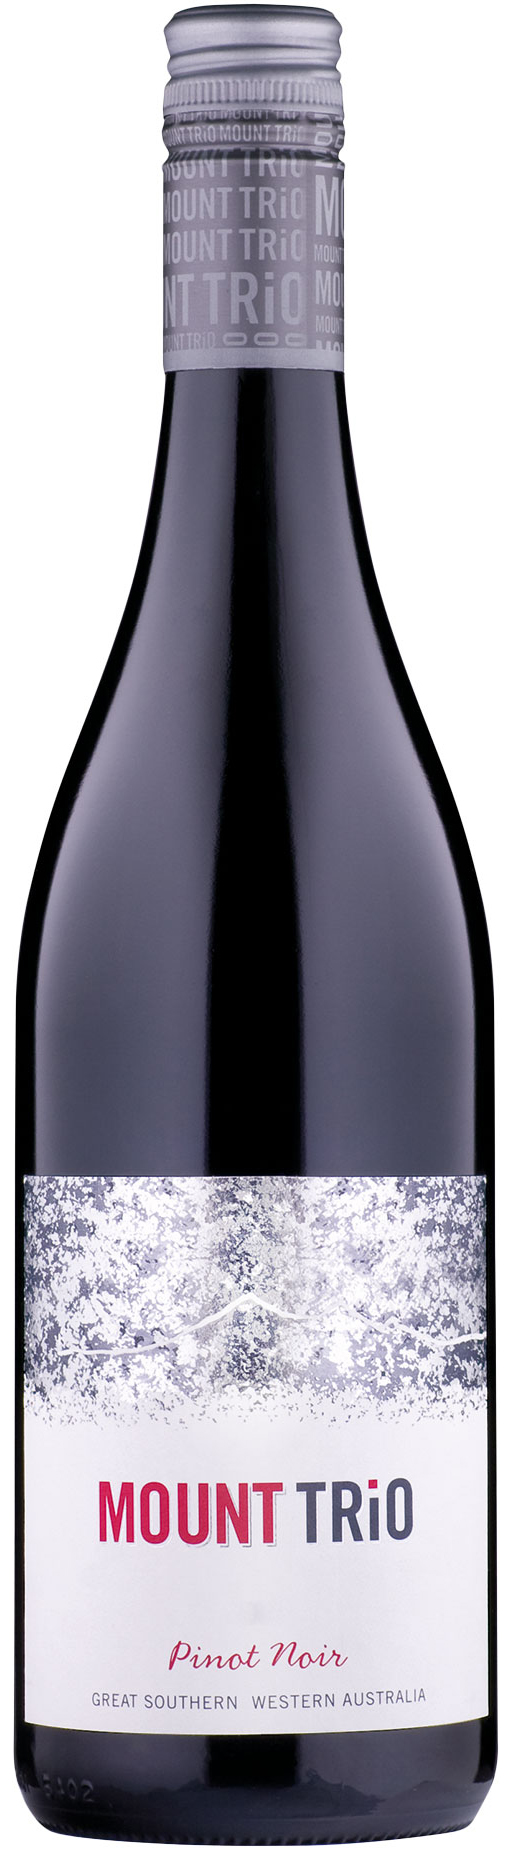 Mount Trio Pinot Noir 2011